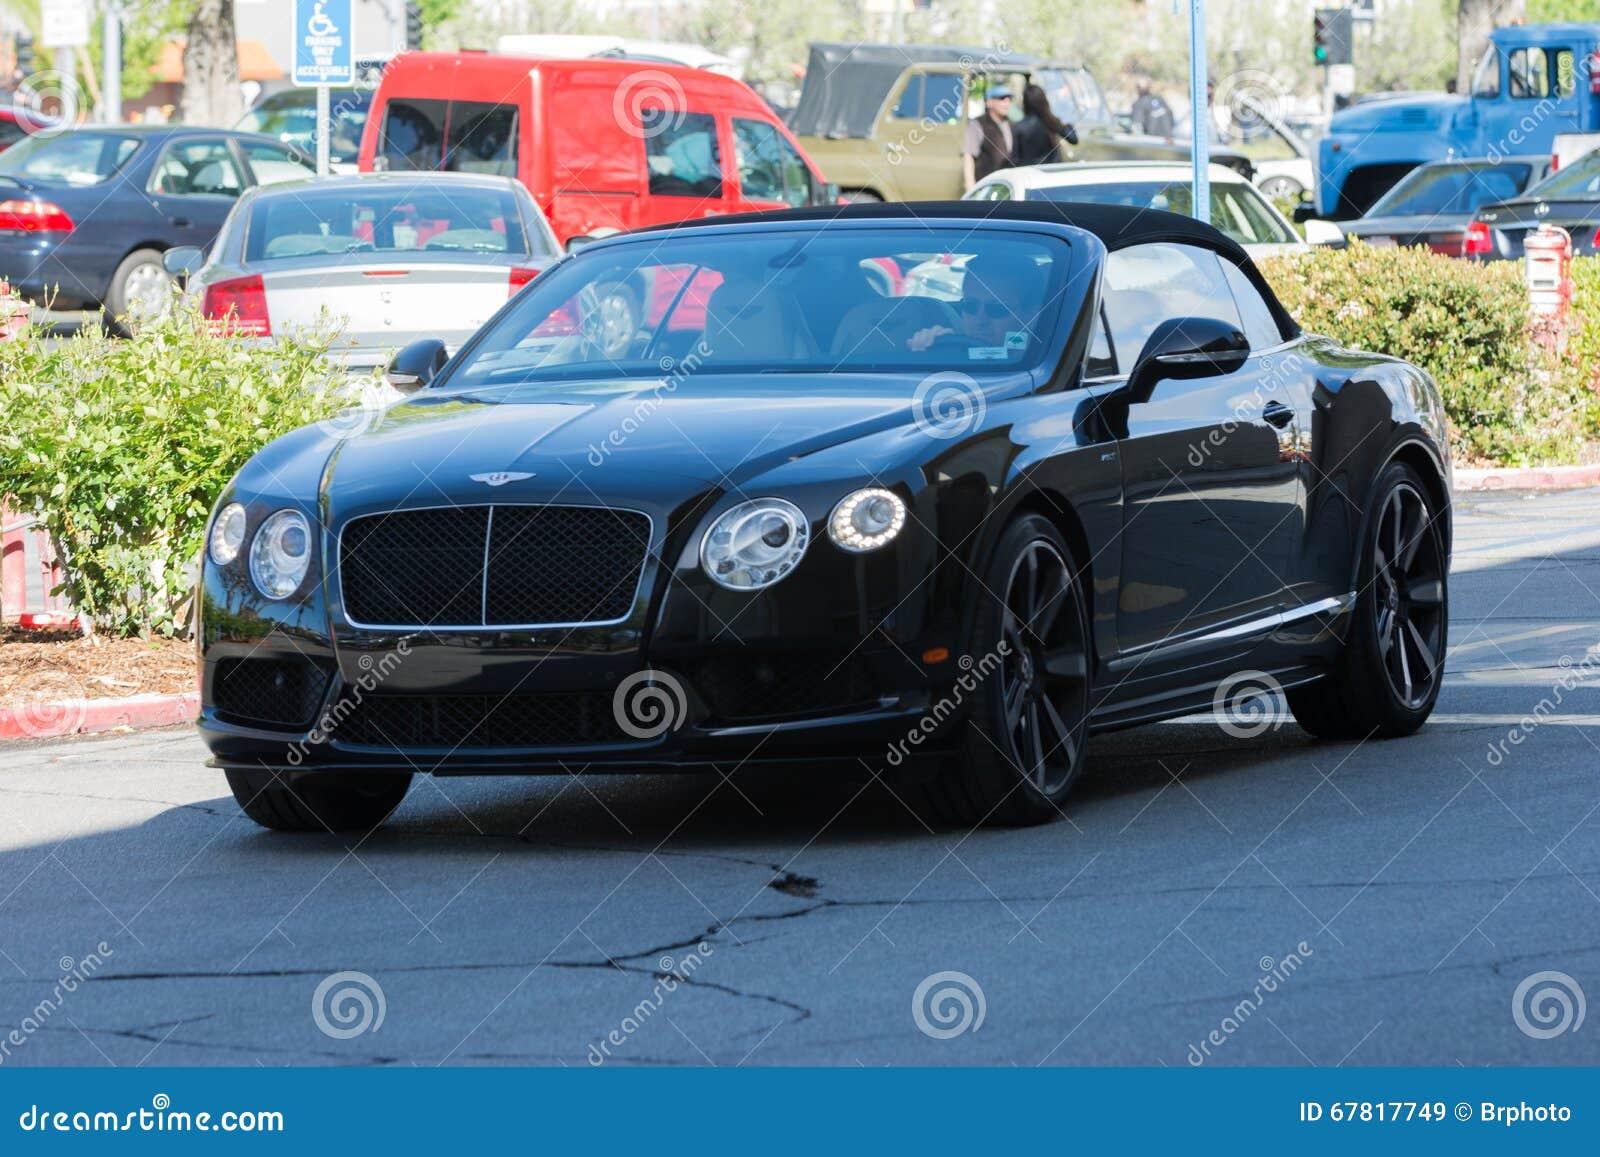 Bentley Continental Gt Convertible Editorial Stock Image